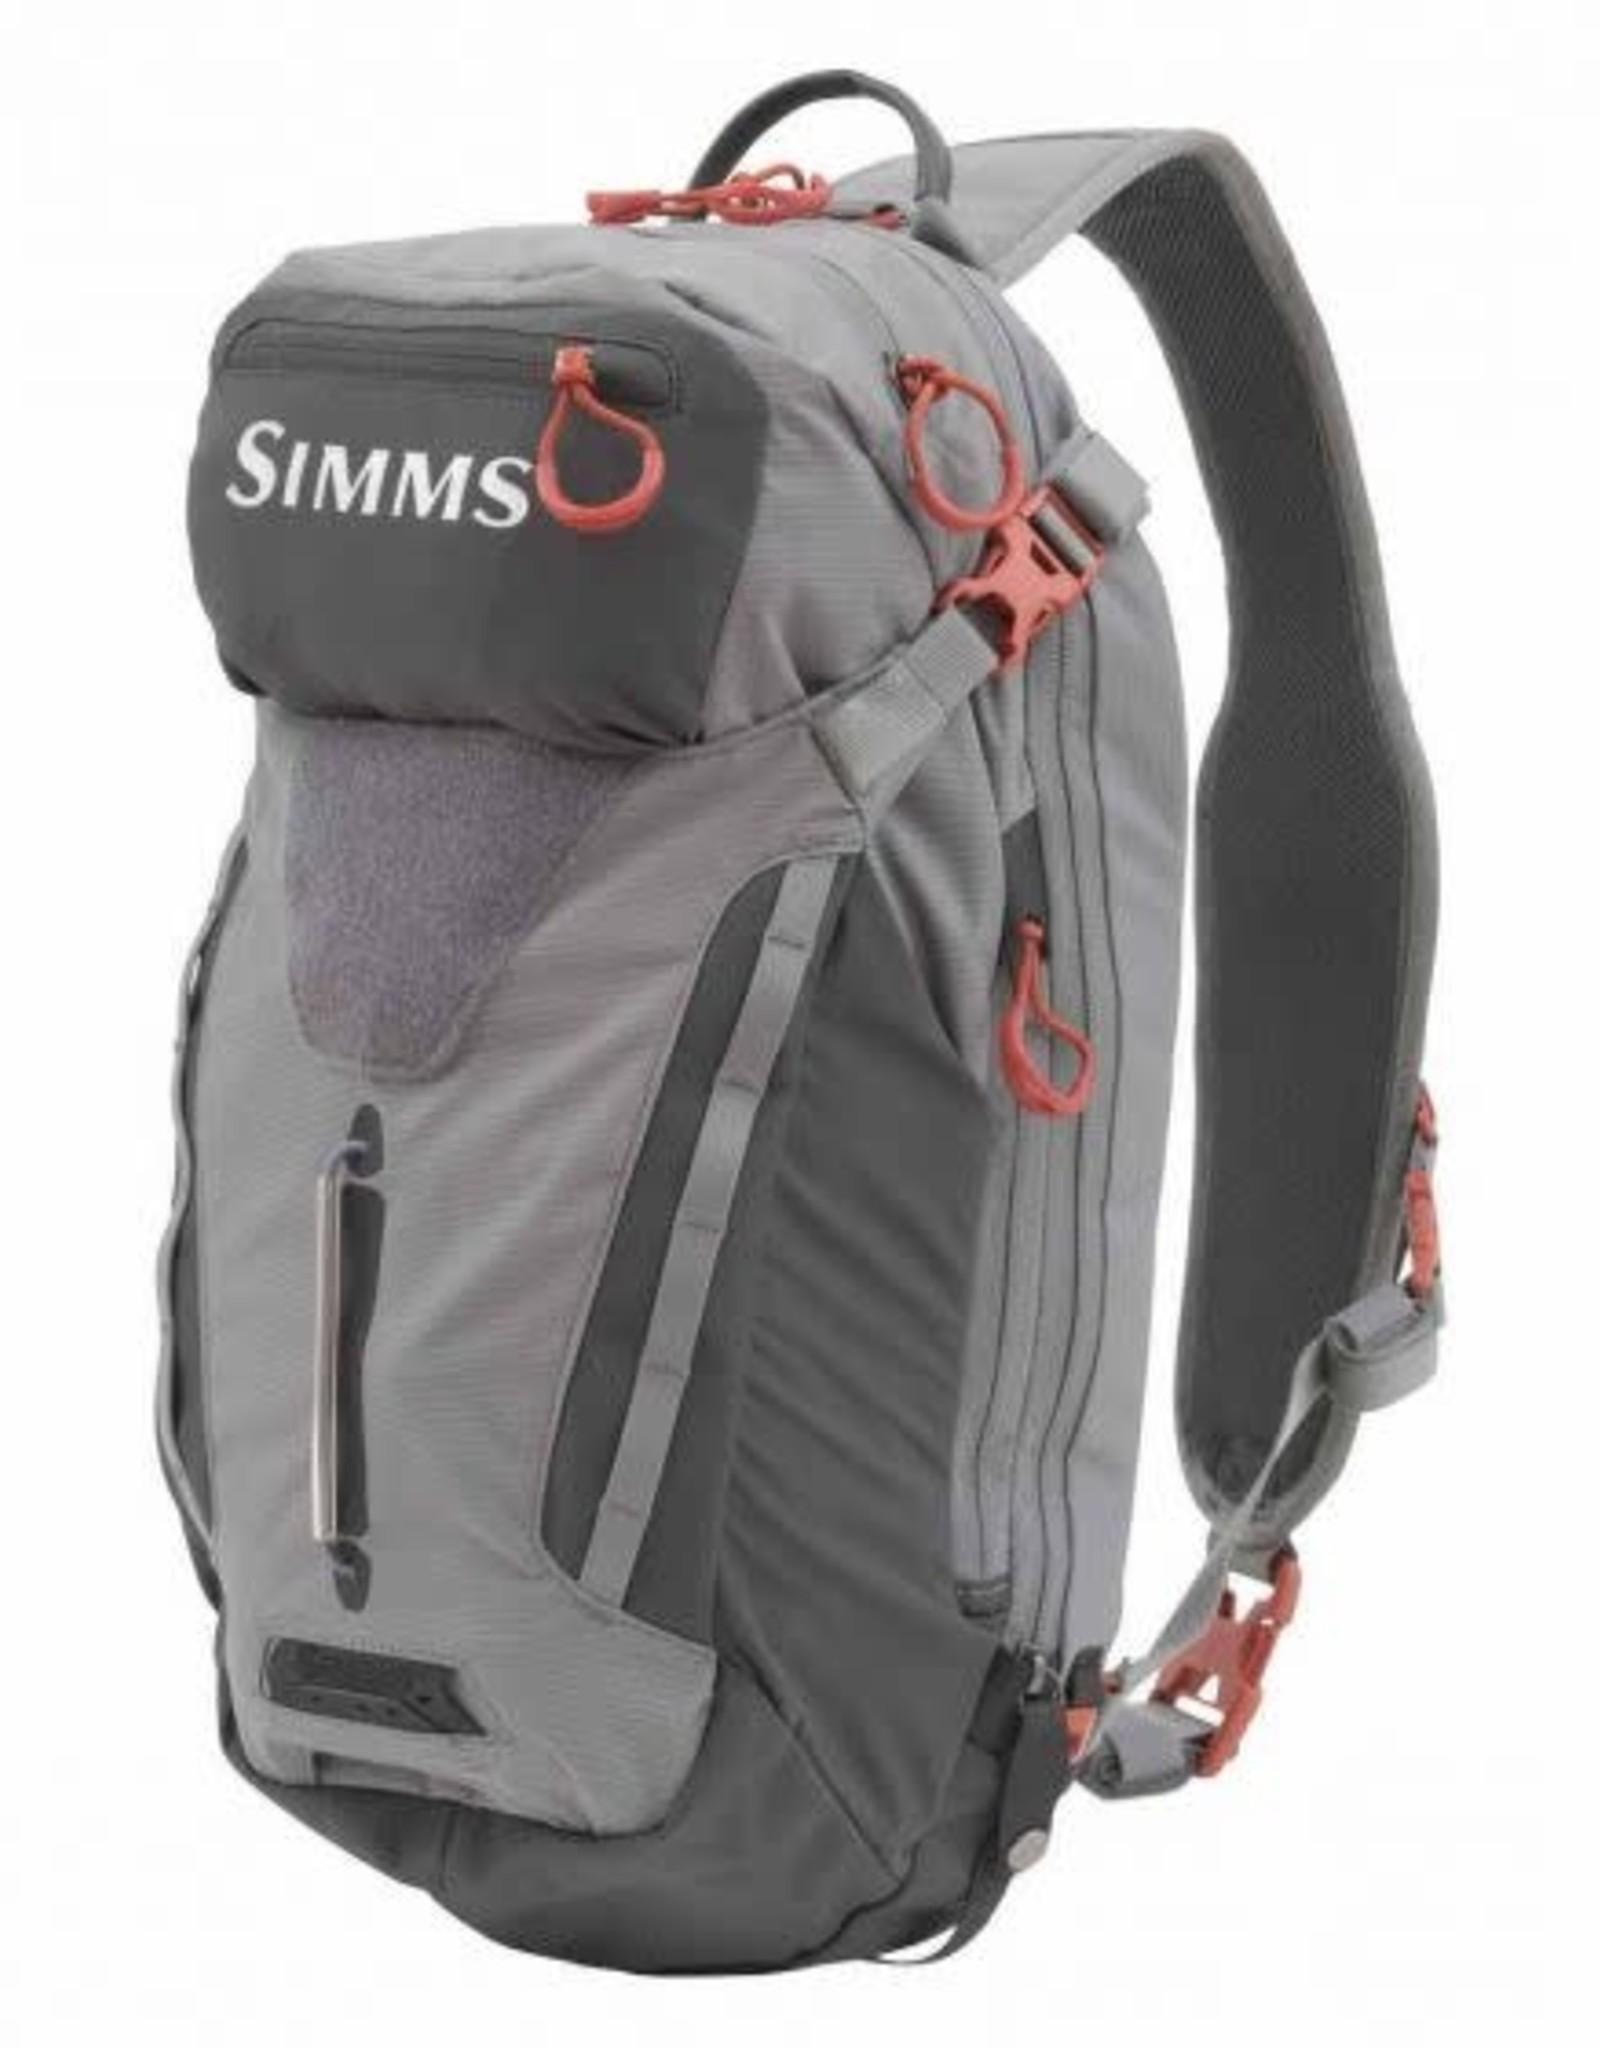 Simms Simms Freestone Ambidextrous Sling Pack - Steel